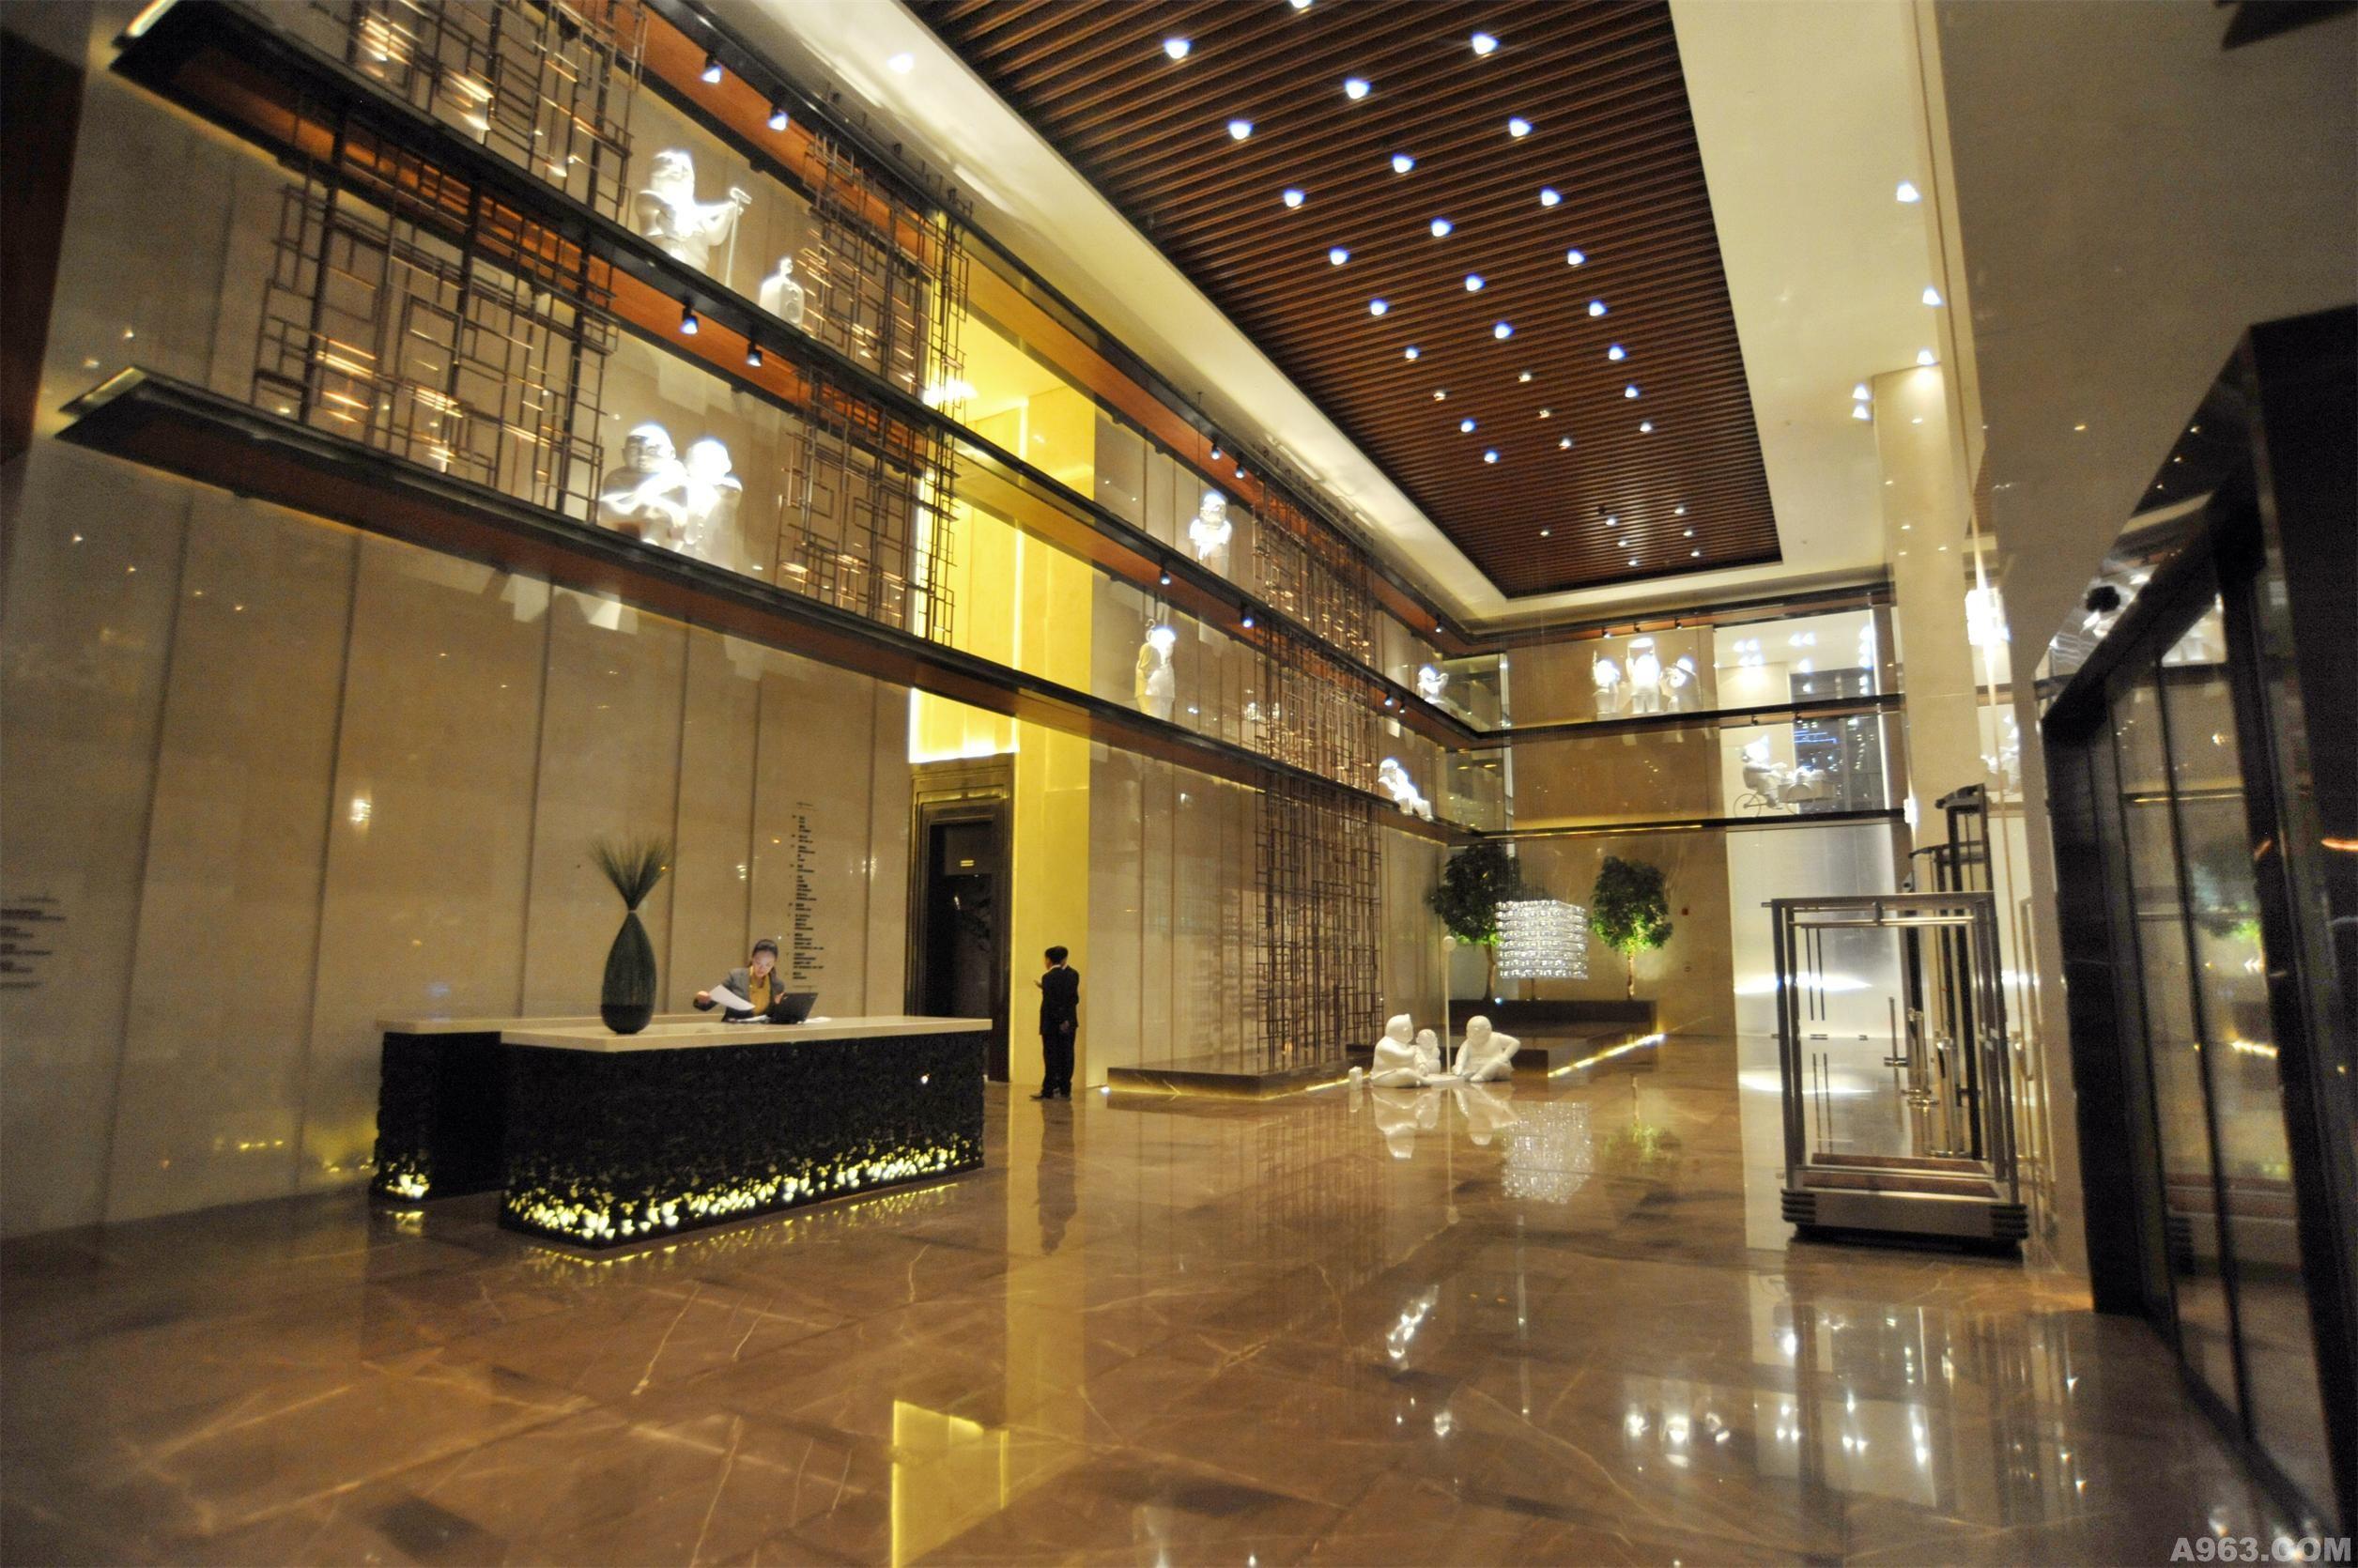 沈阳华润君悦酒店(SHENYANG GRAND HYATT HOTEL)